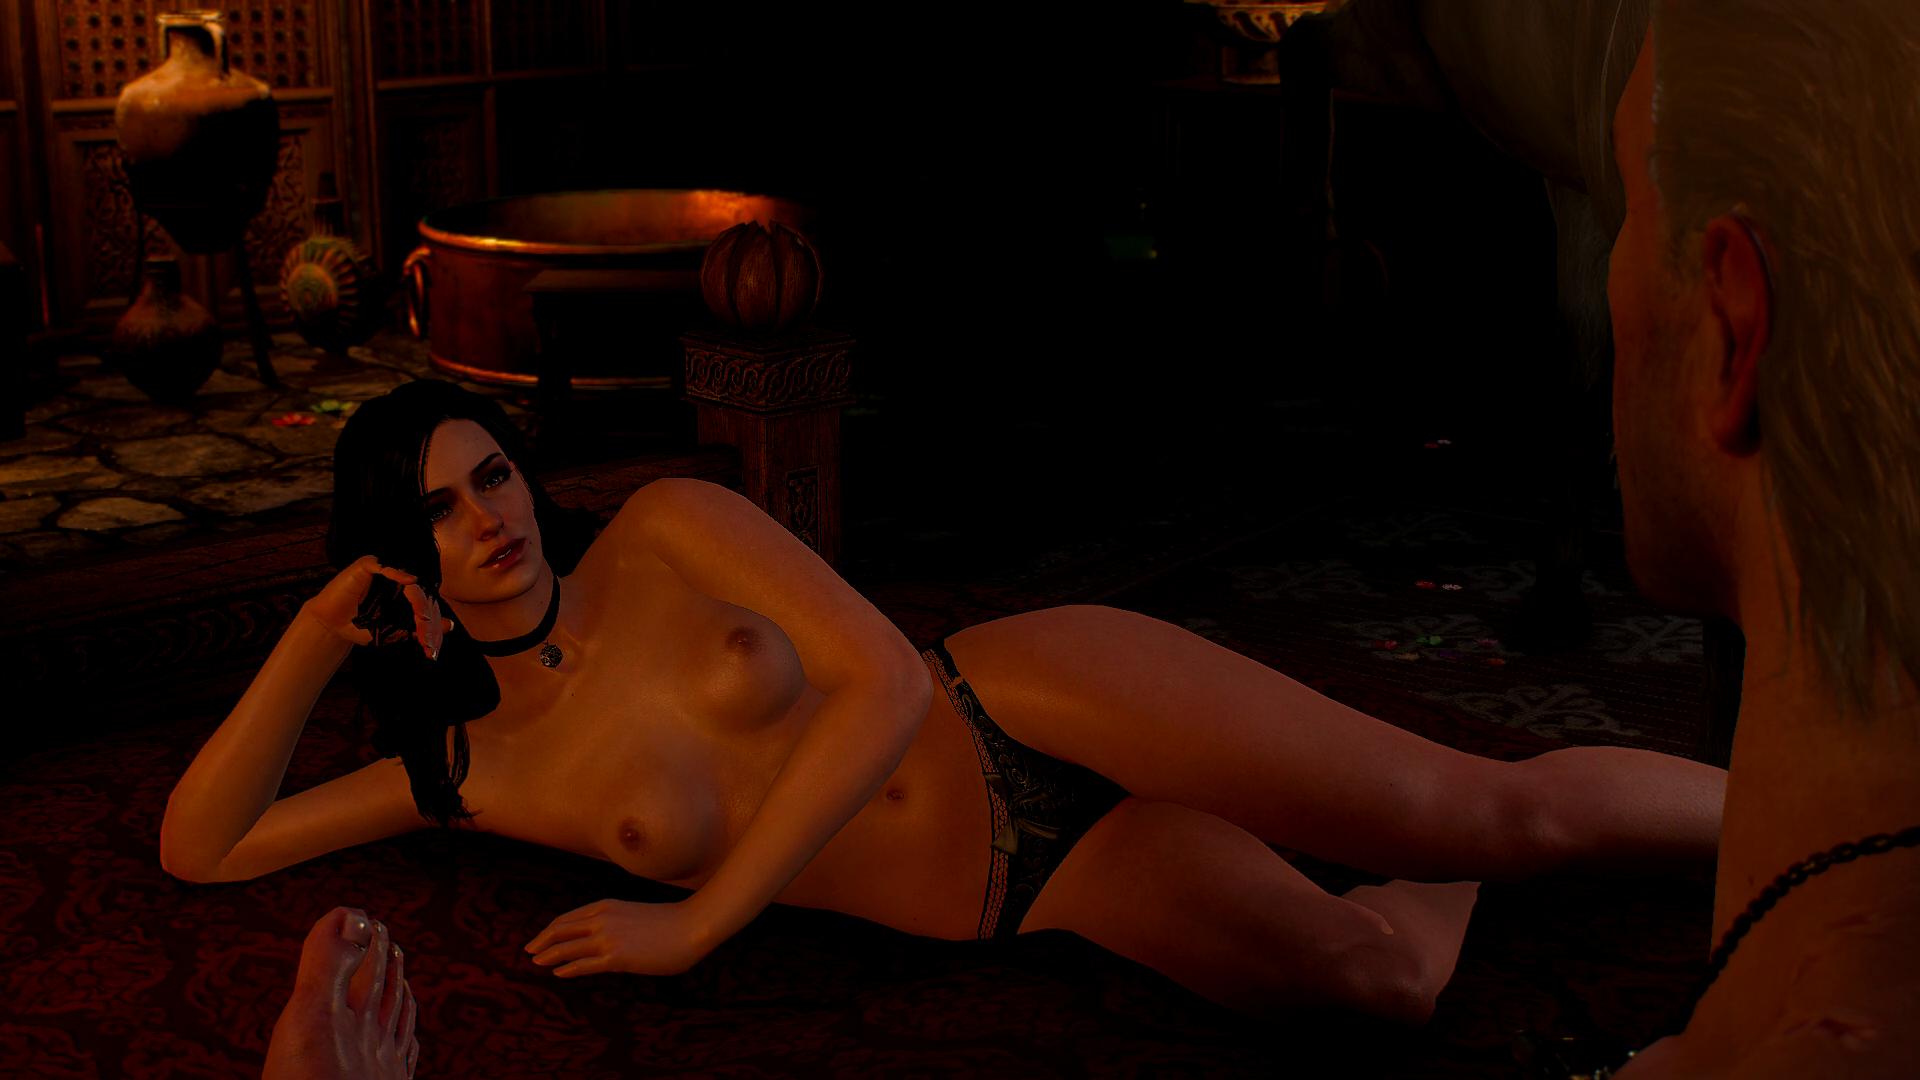 The witcher porno videos porn image